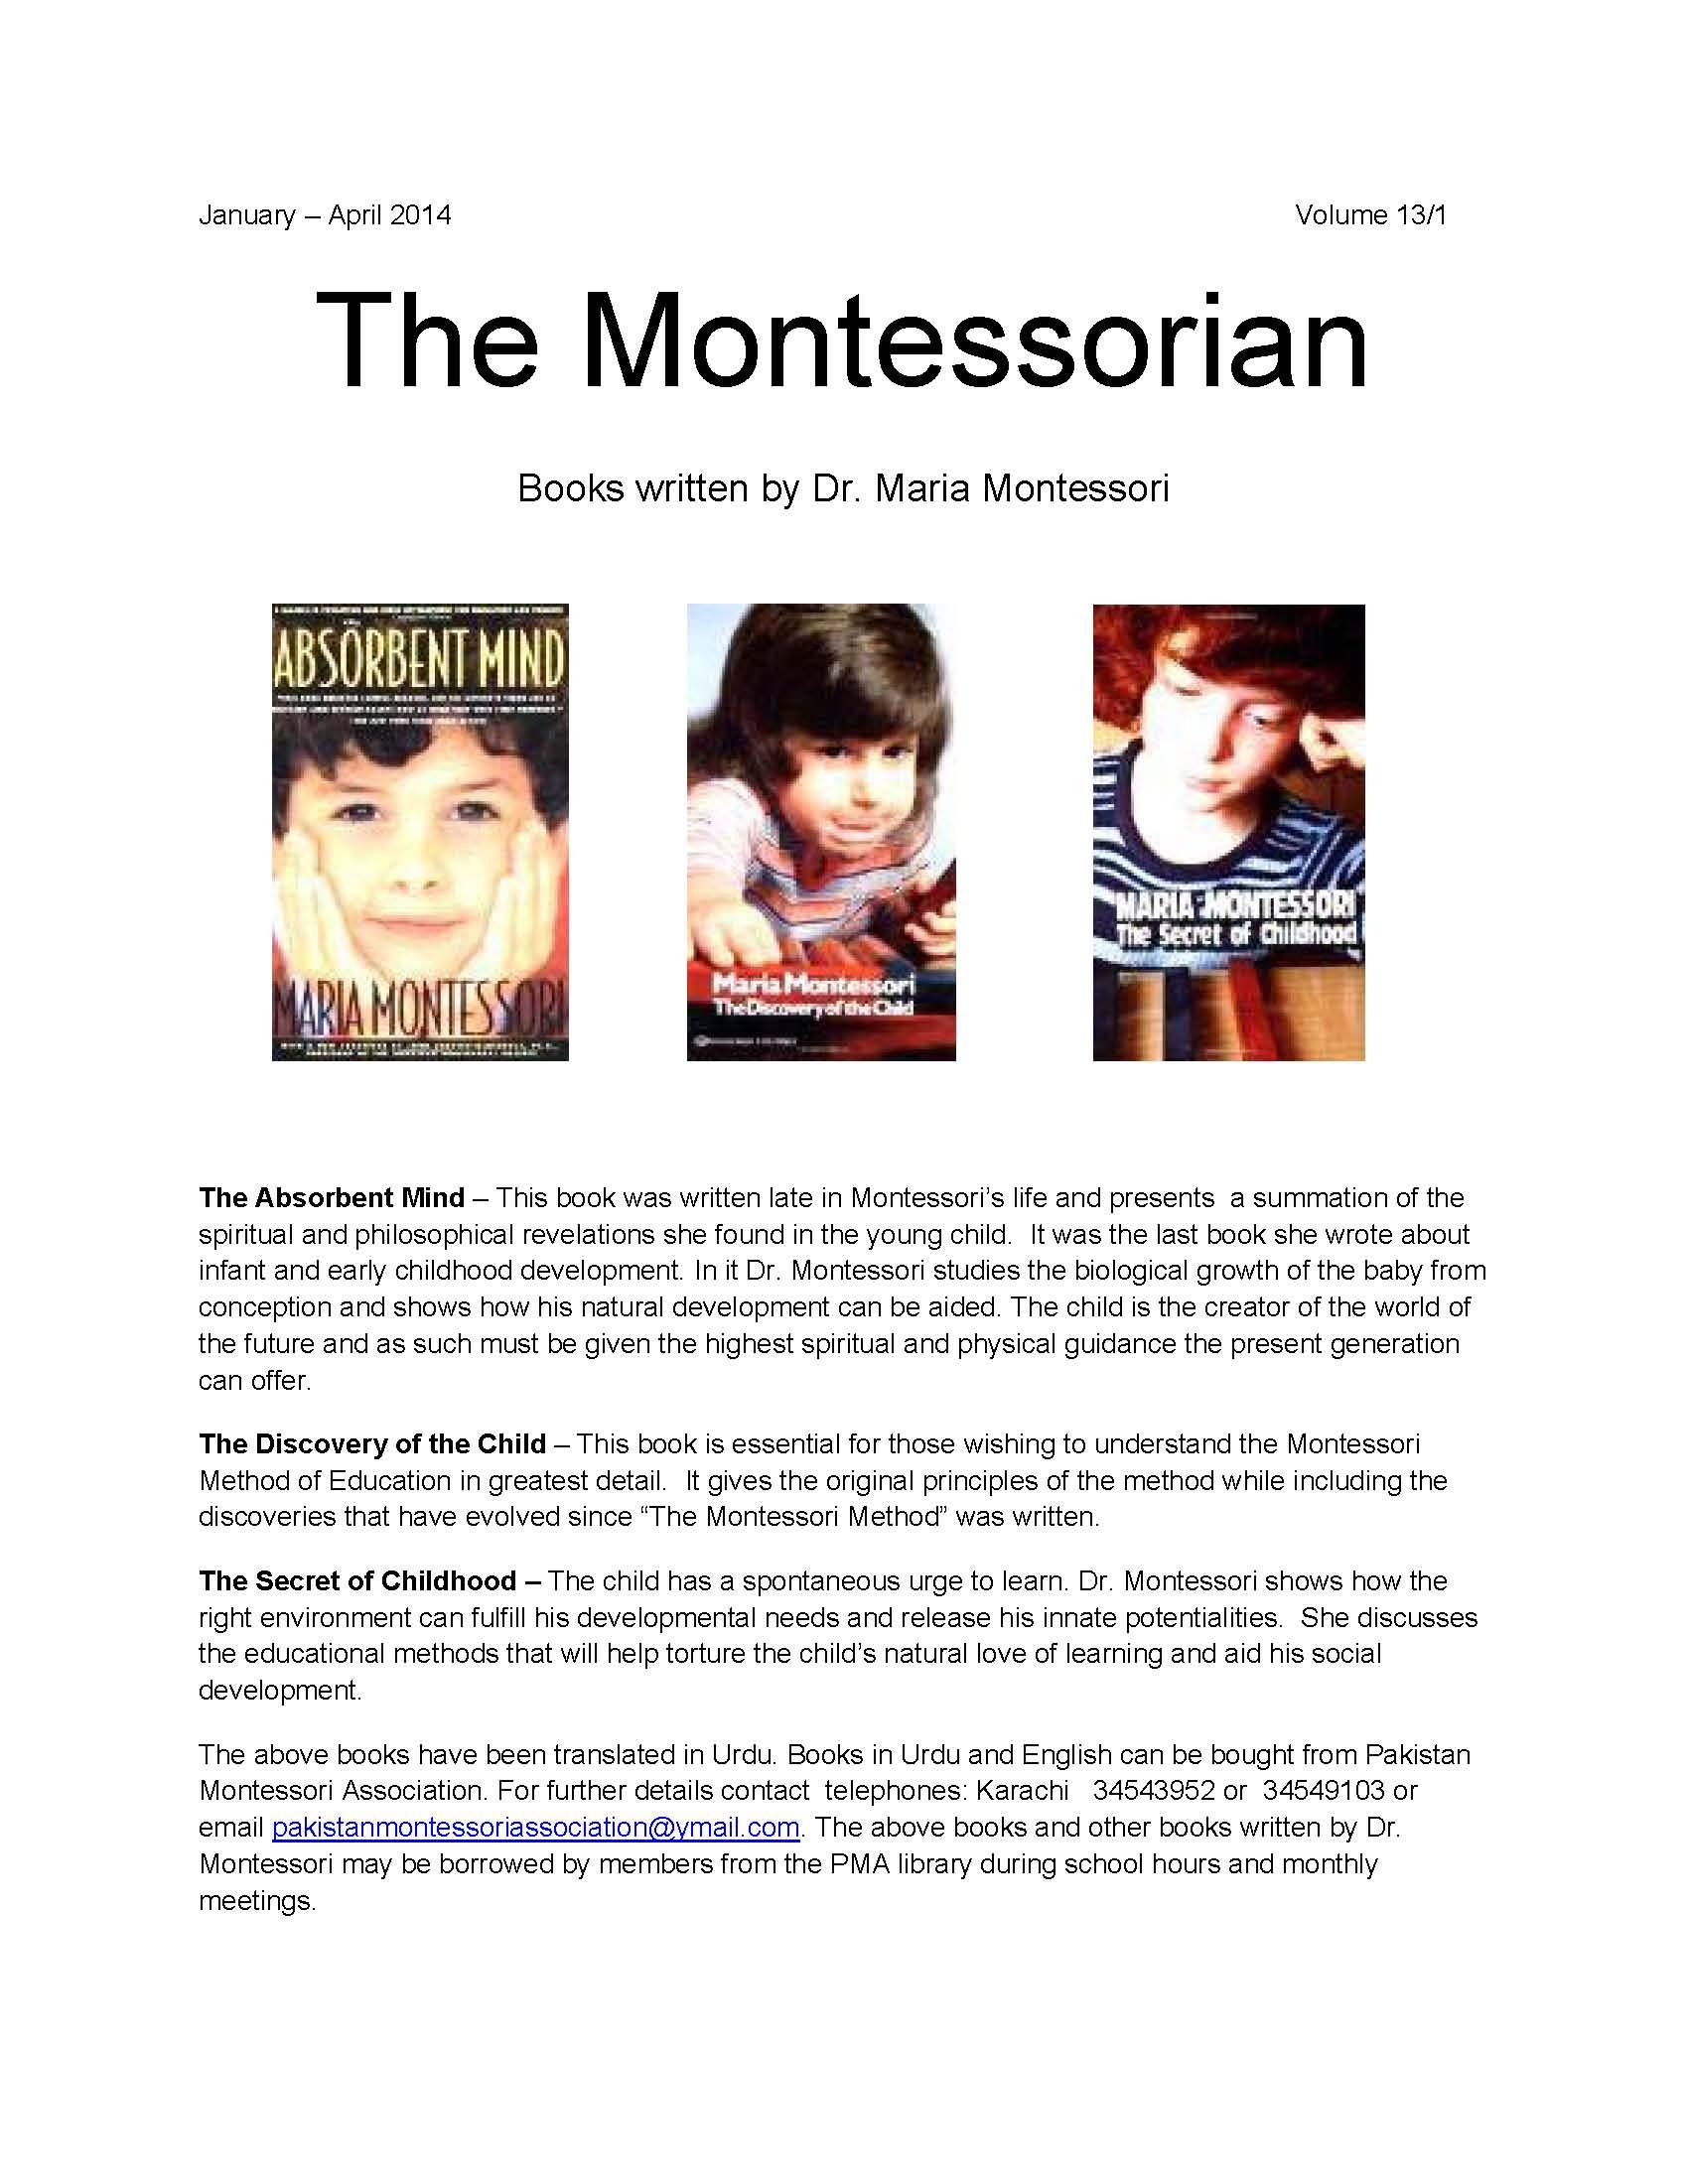 Montessorian_Jan-April_2014_Page_1